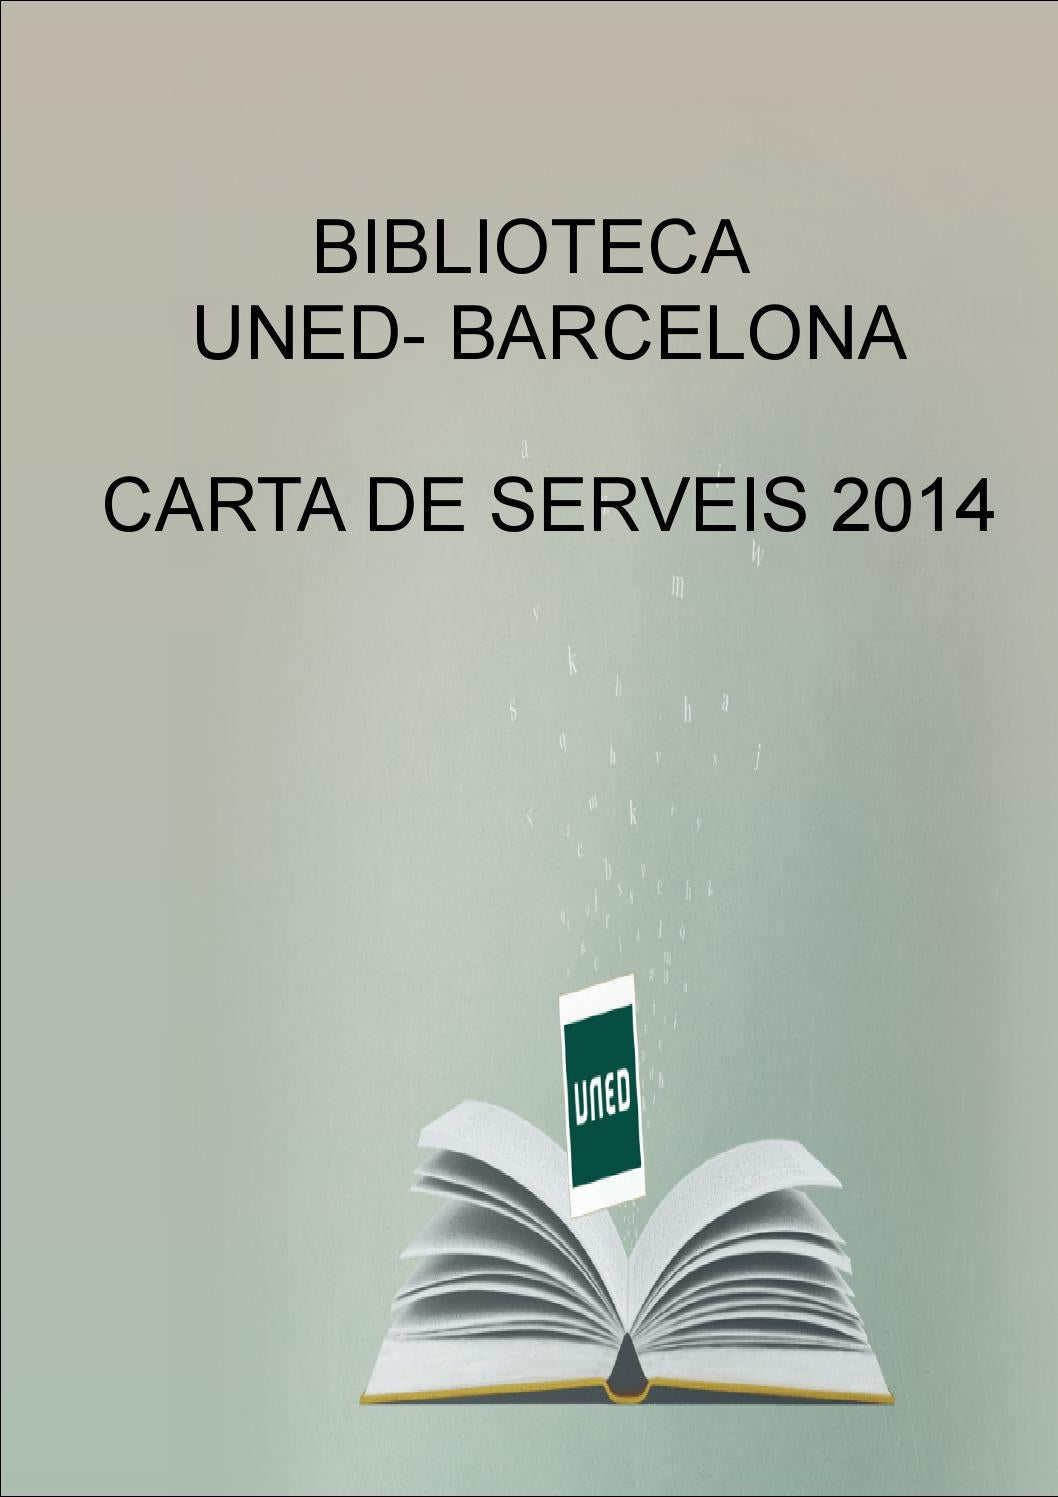 Carta de serveis de la biblioteca uned barcelona by for Biblioteca uned